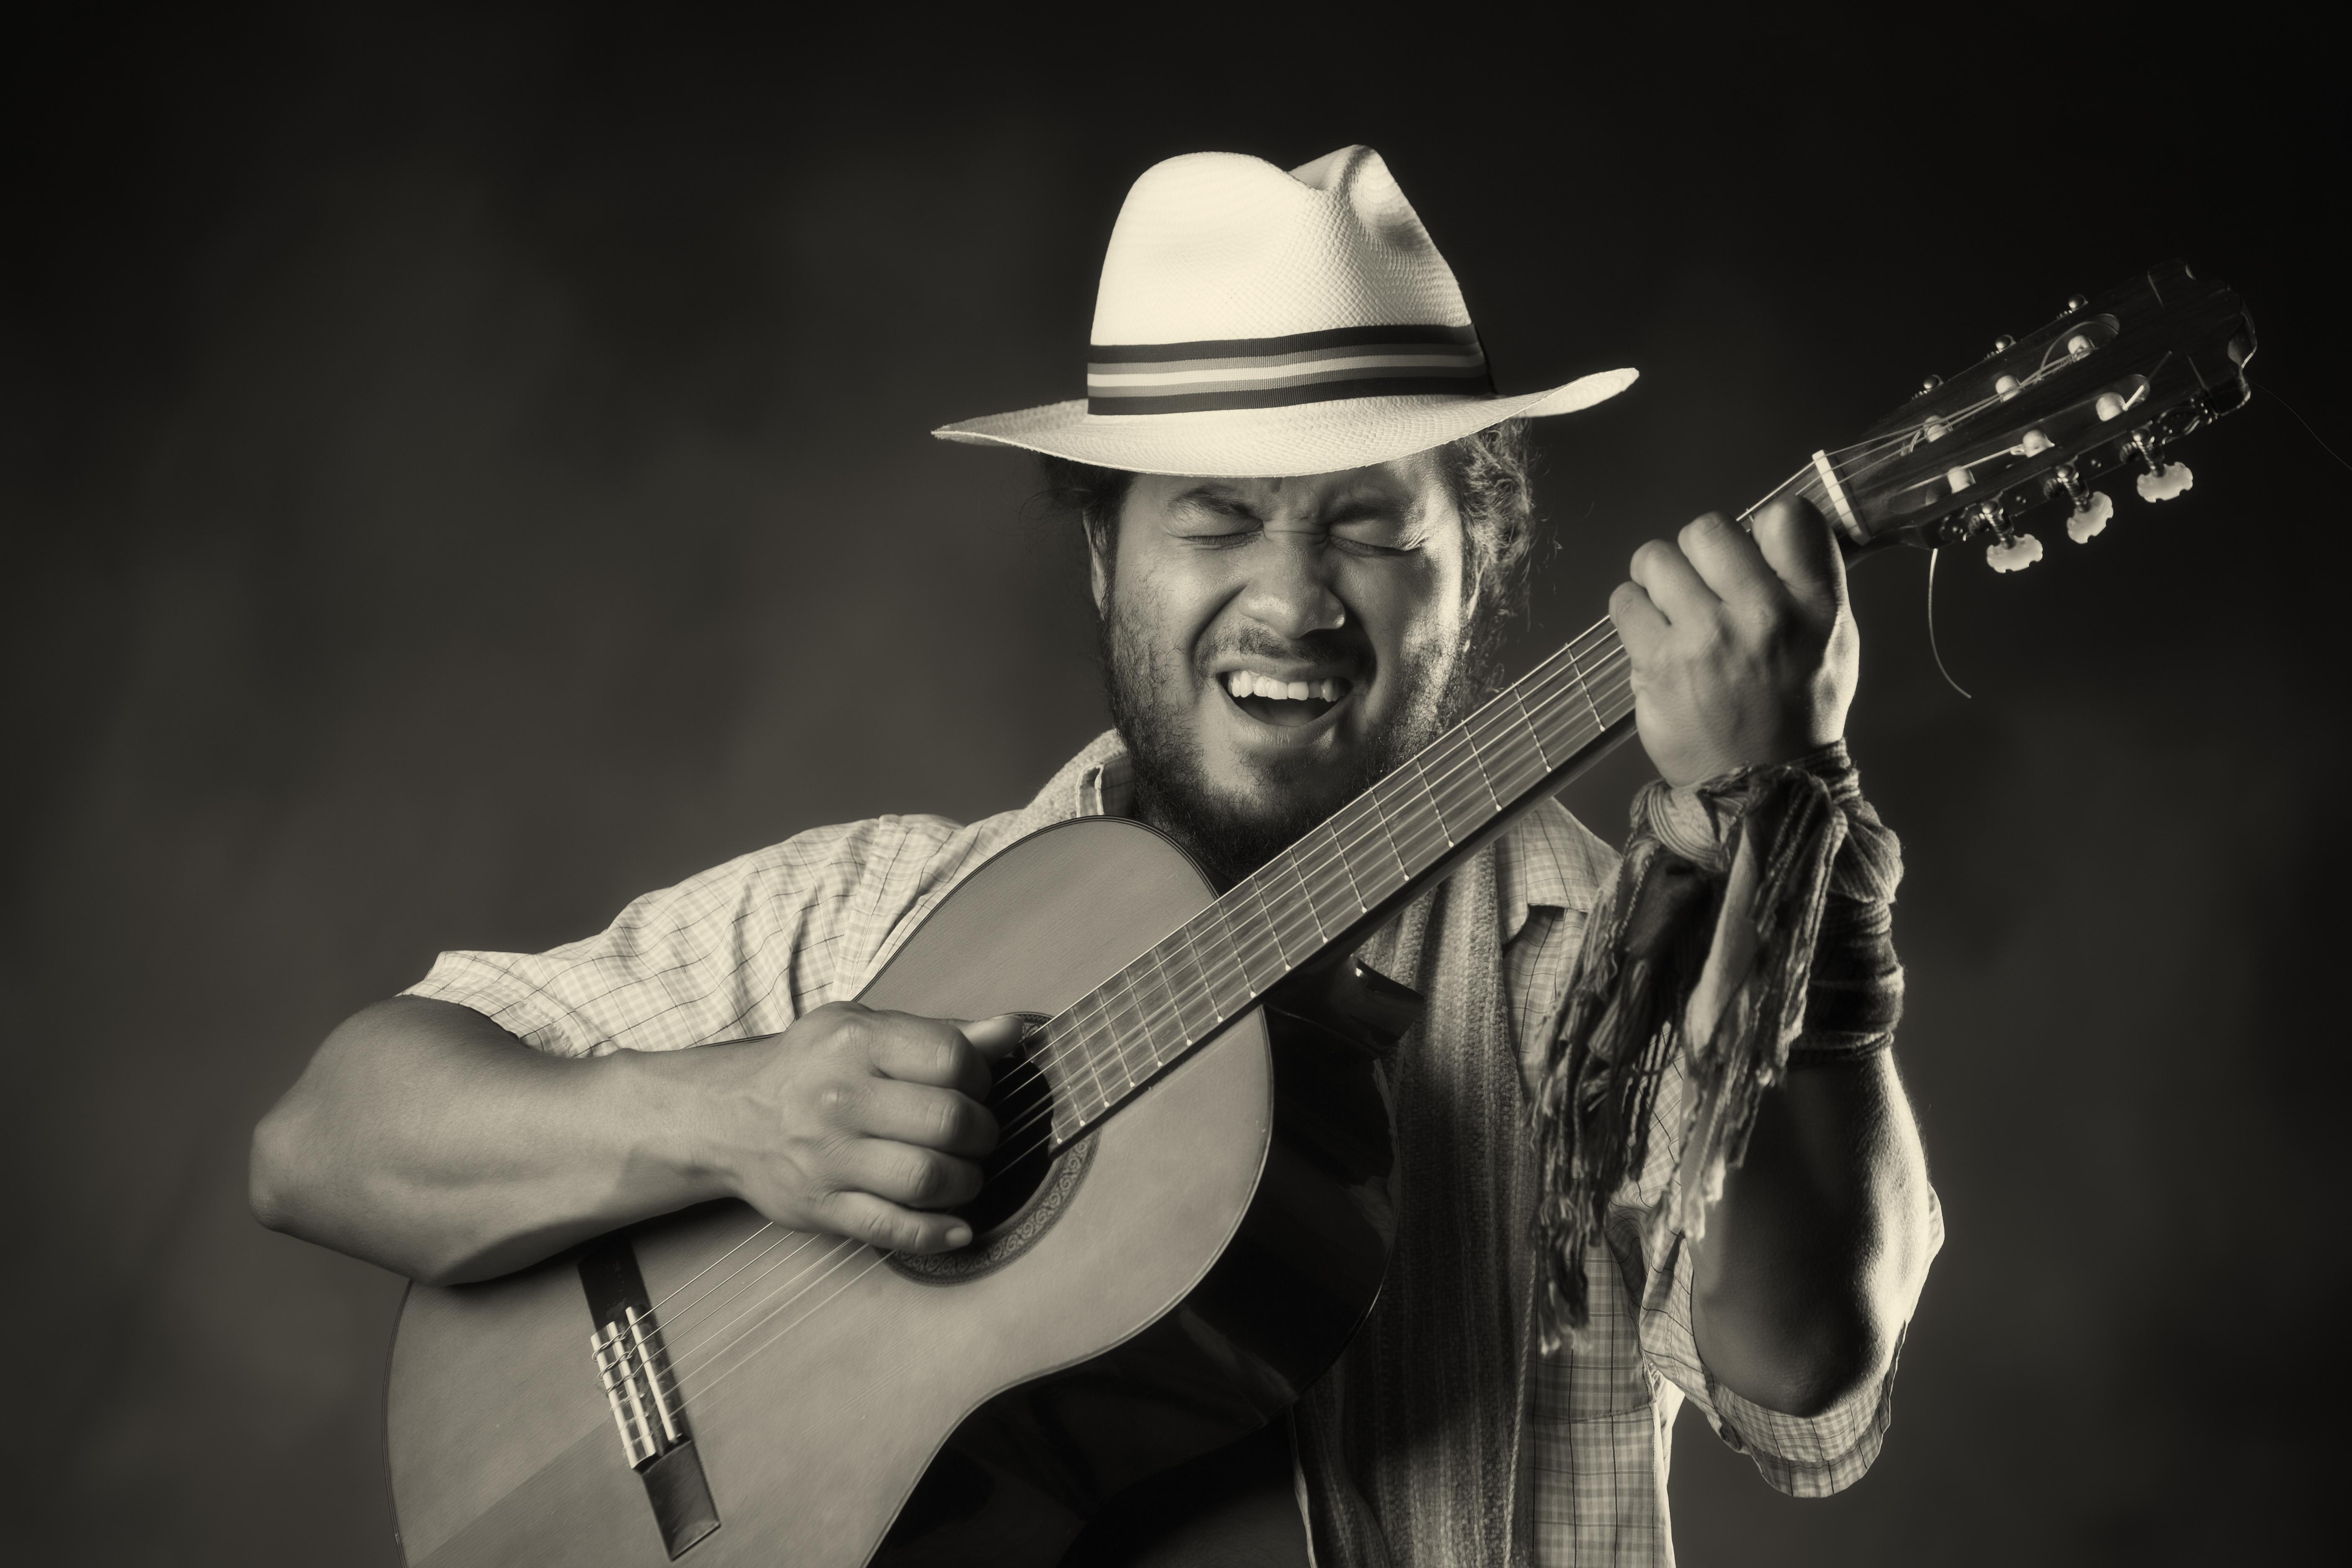 Rastafarian Man Playing Classic Guitar